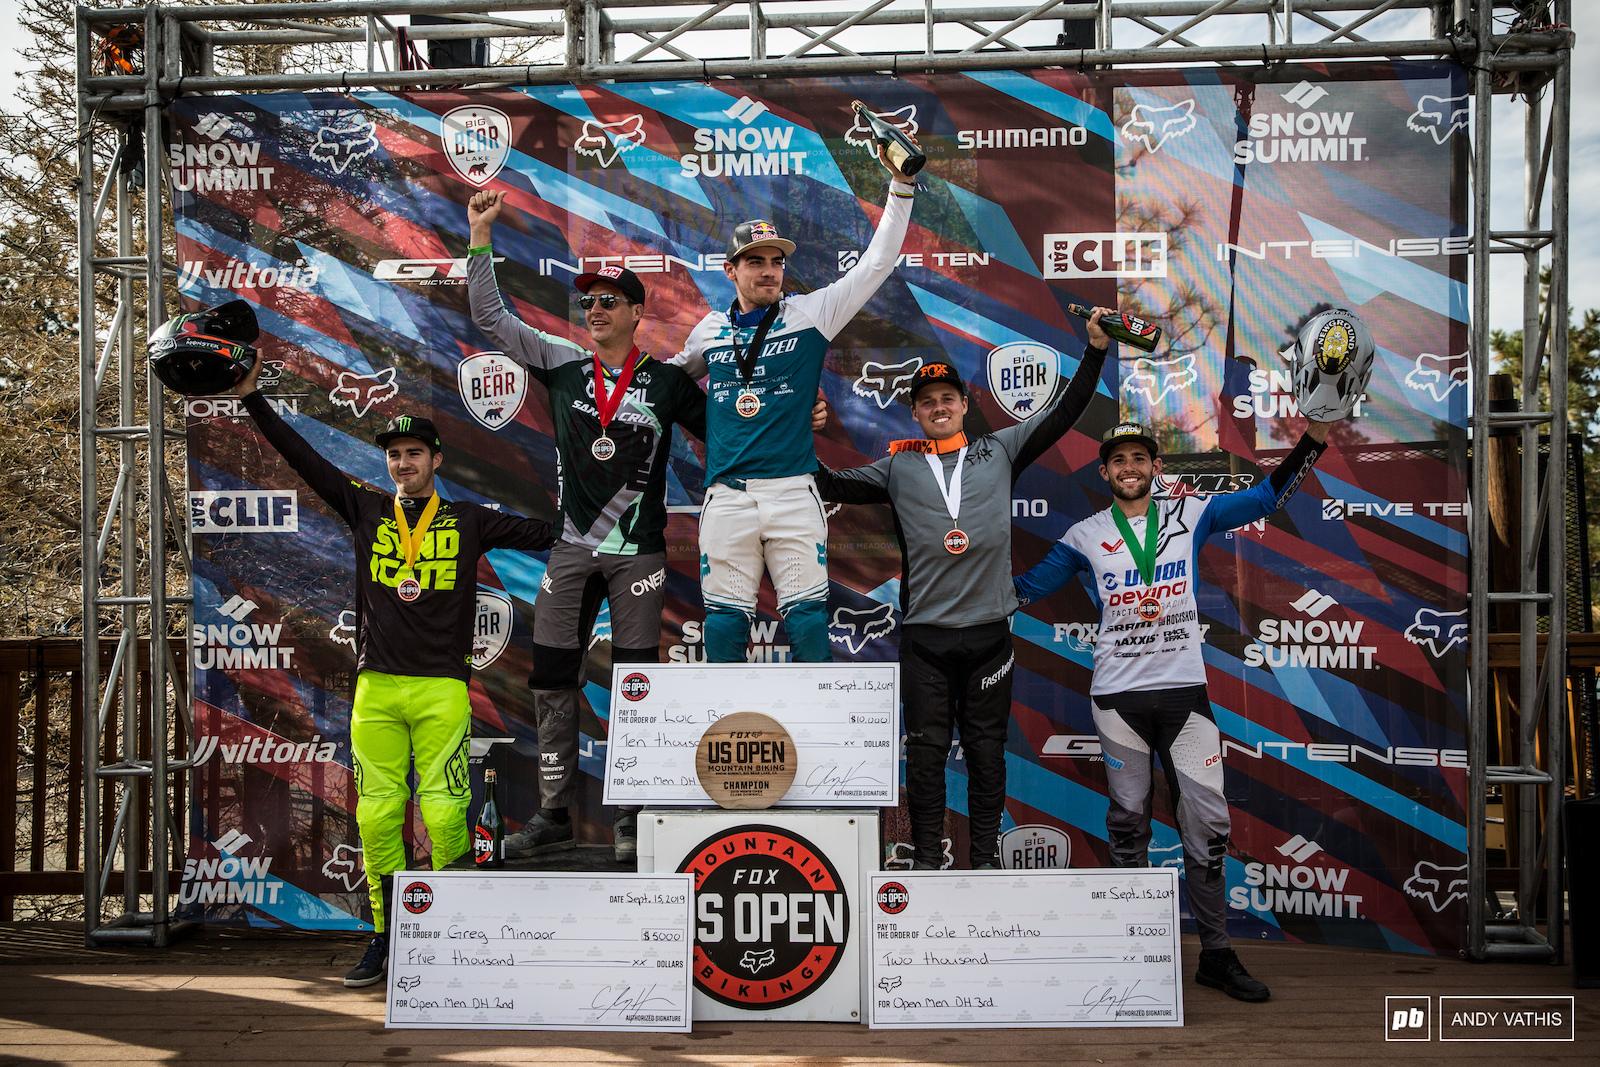 Loic Bruni Greg Minnaar Cole Picchiottino Luca Shaw and Dakotah Norton close out the Men s Open podium.